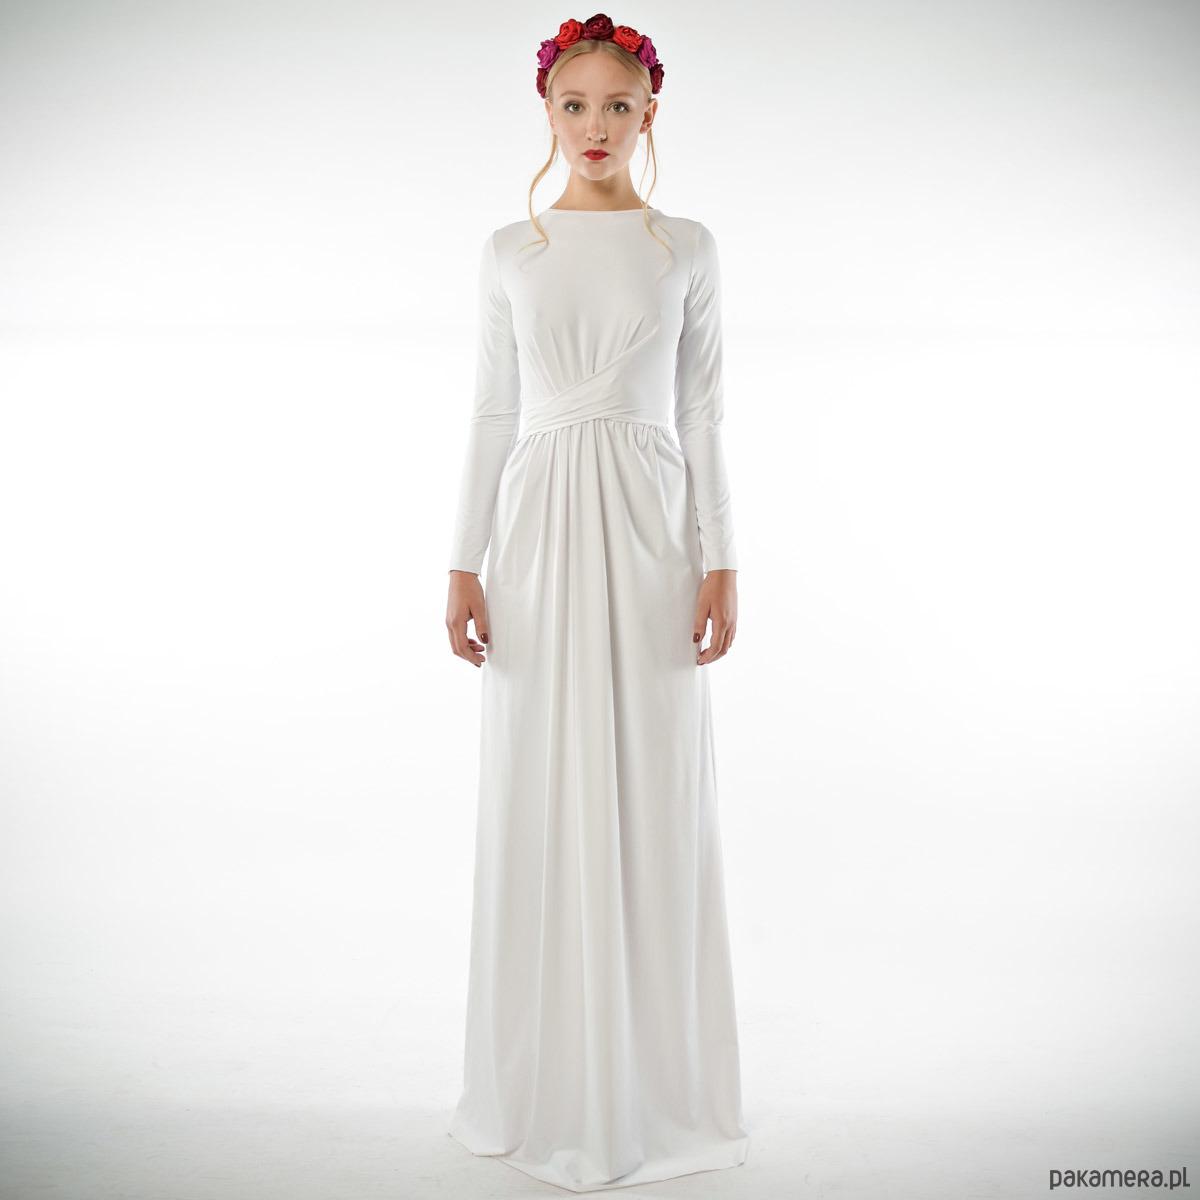 3ea44ef888 Cristina Patria 2   biała suknia - Ślub - suknie - Pakamera.pl